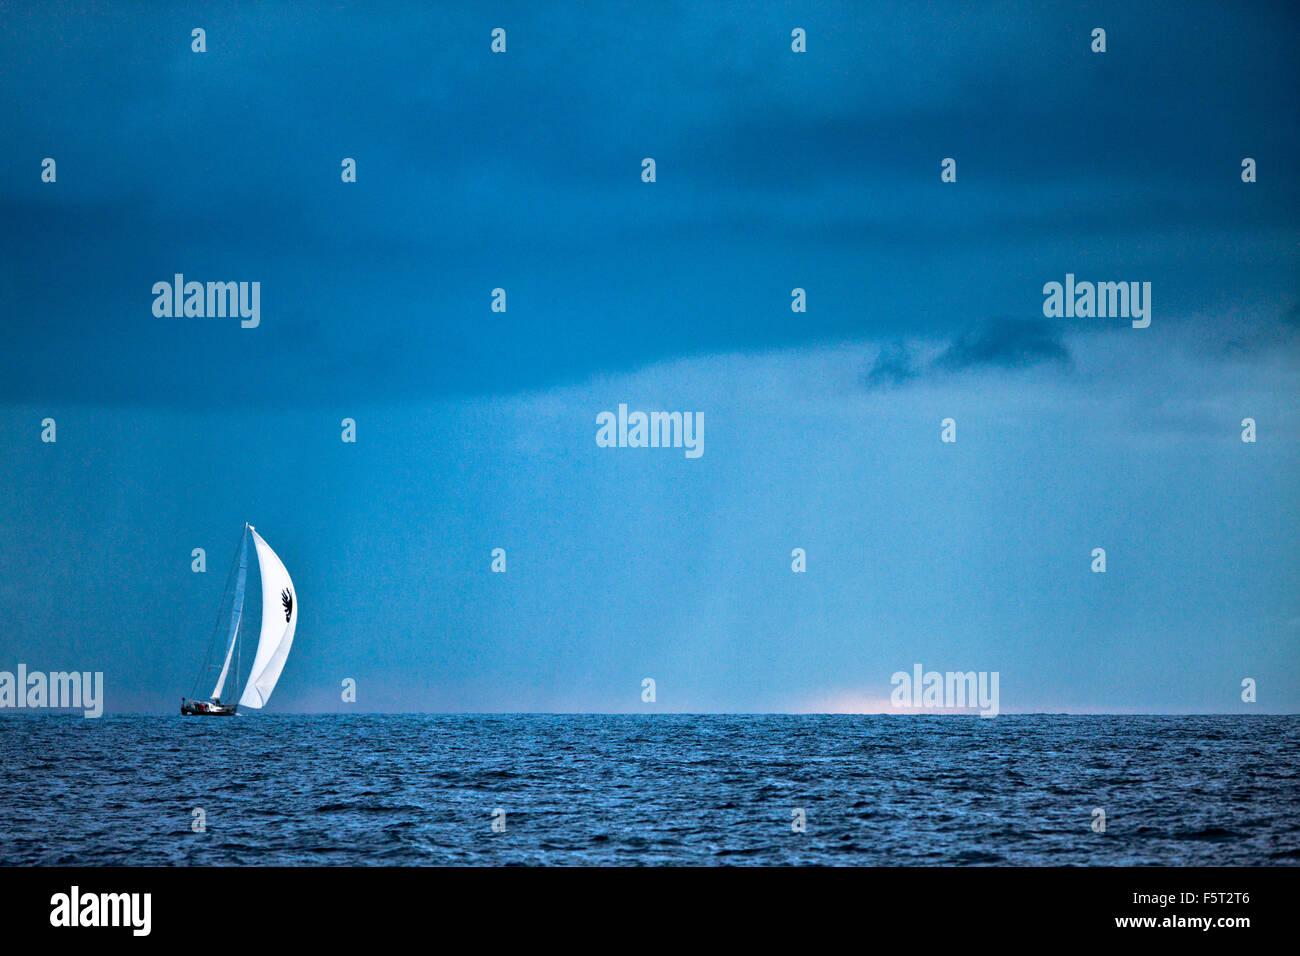 Antigua and Barbuda, Antigua, Sailboat in sea and rain cloud - Stock Image